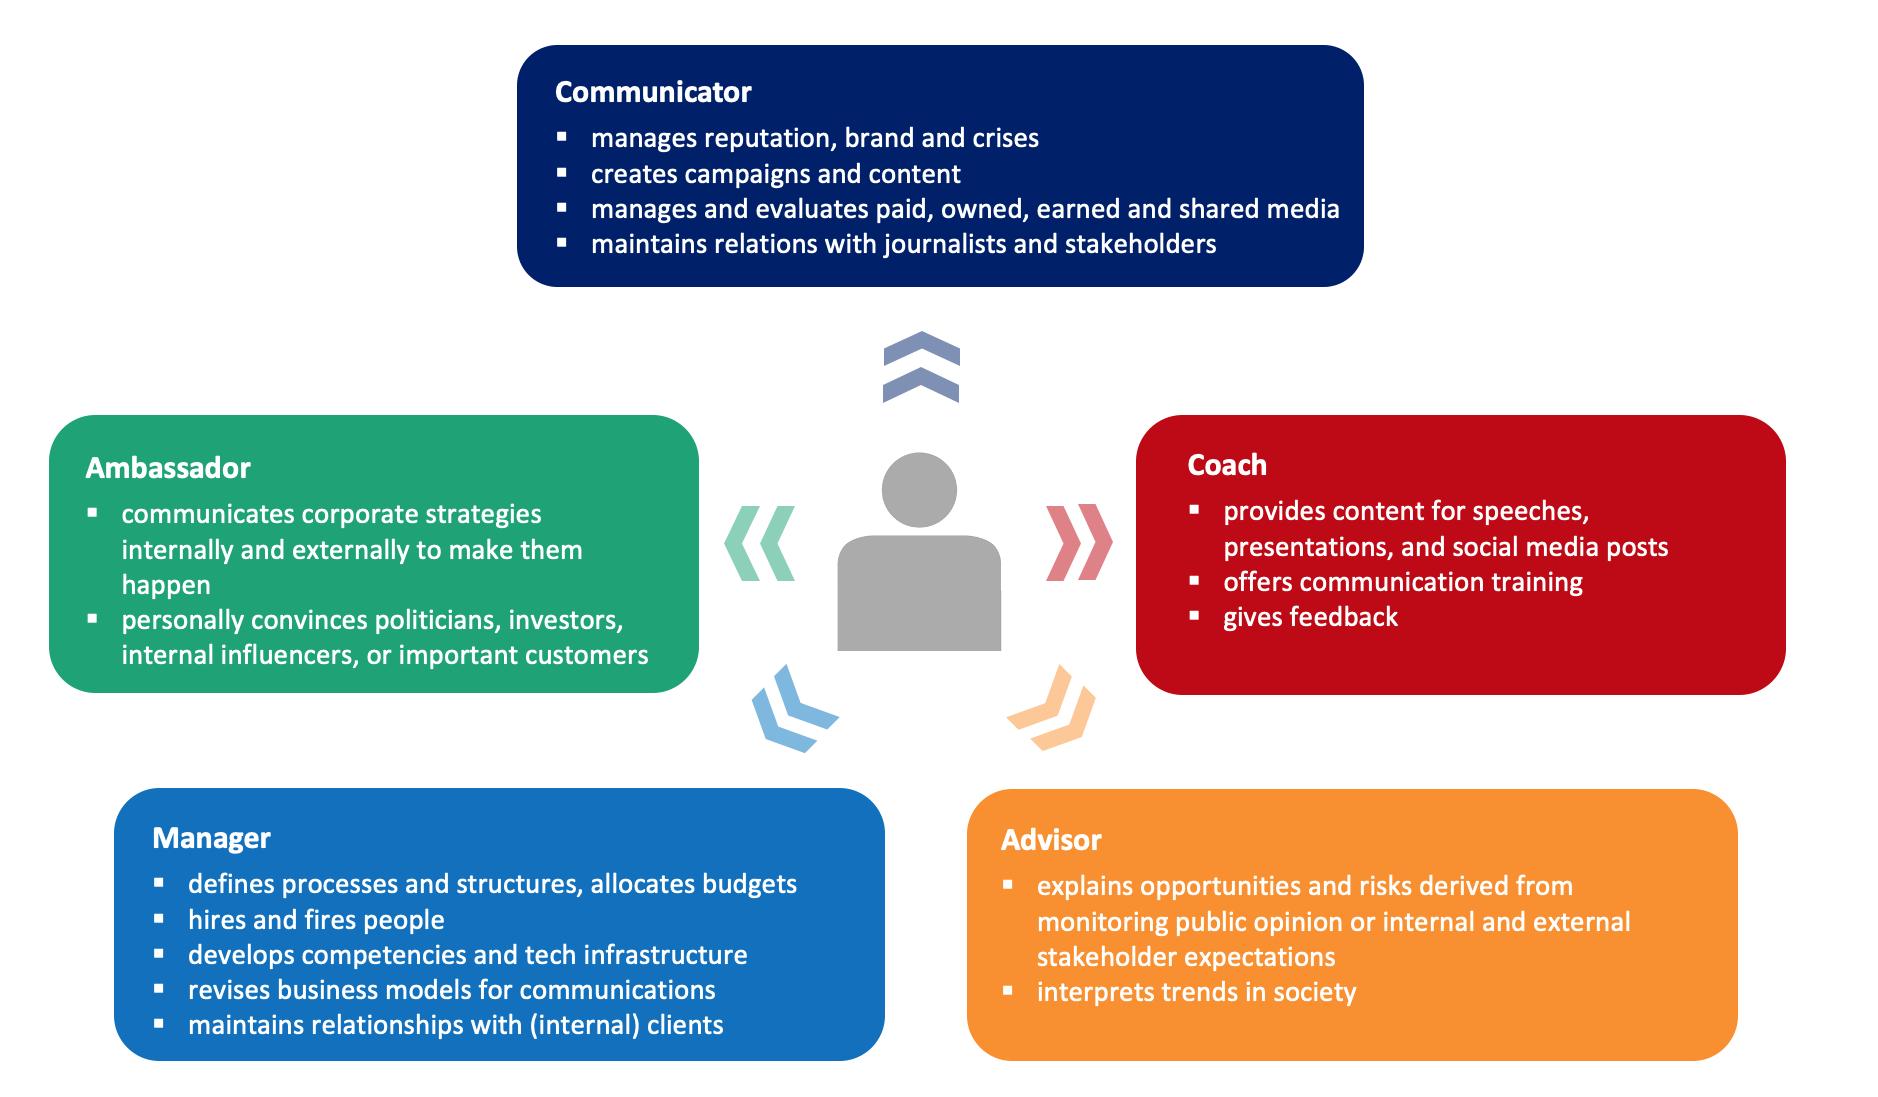 ECM 2021 Grafik Rollen von Kommunikatoren Abb 5